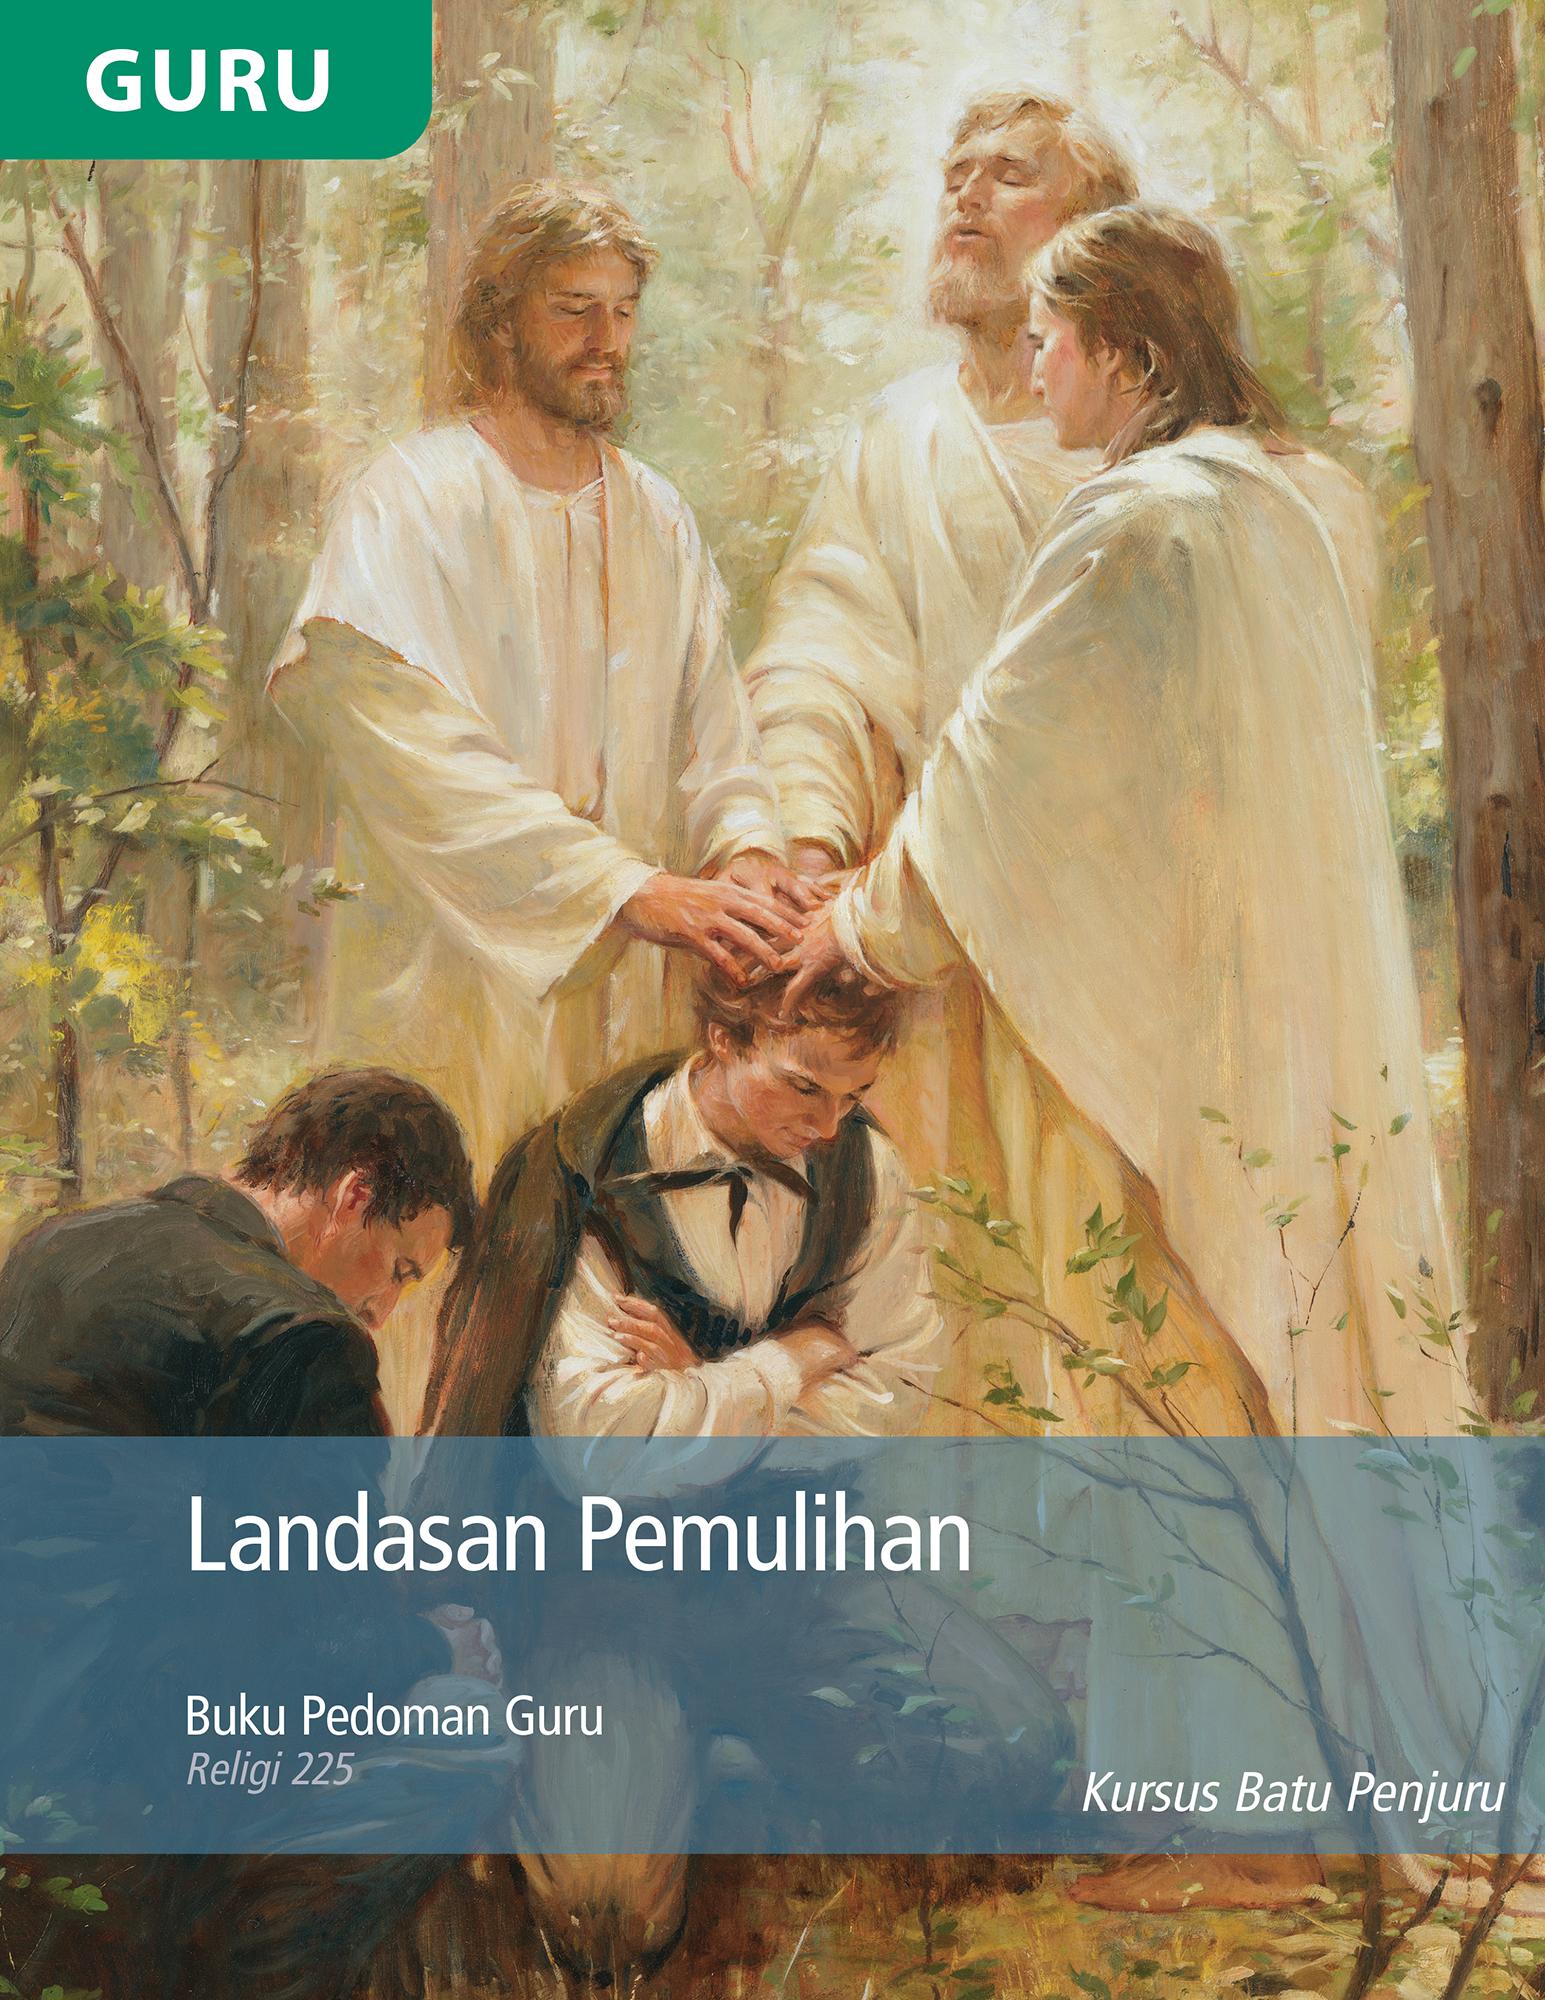 Buku Pedoman Guru Landasan Pemulihan (Religi 225)